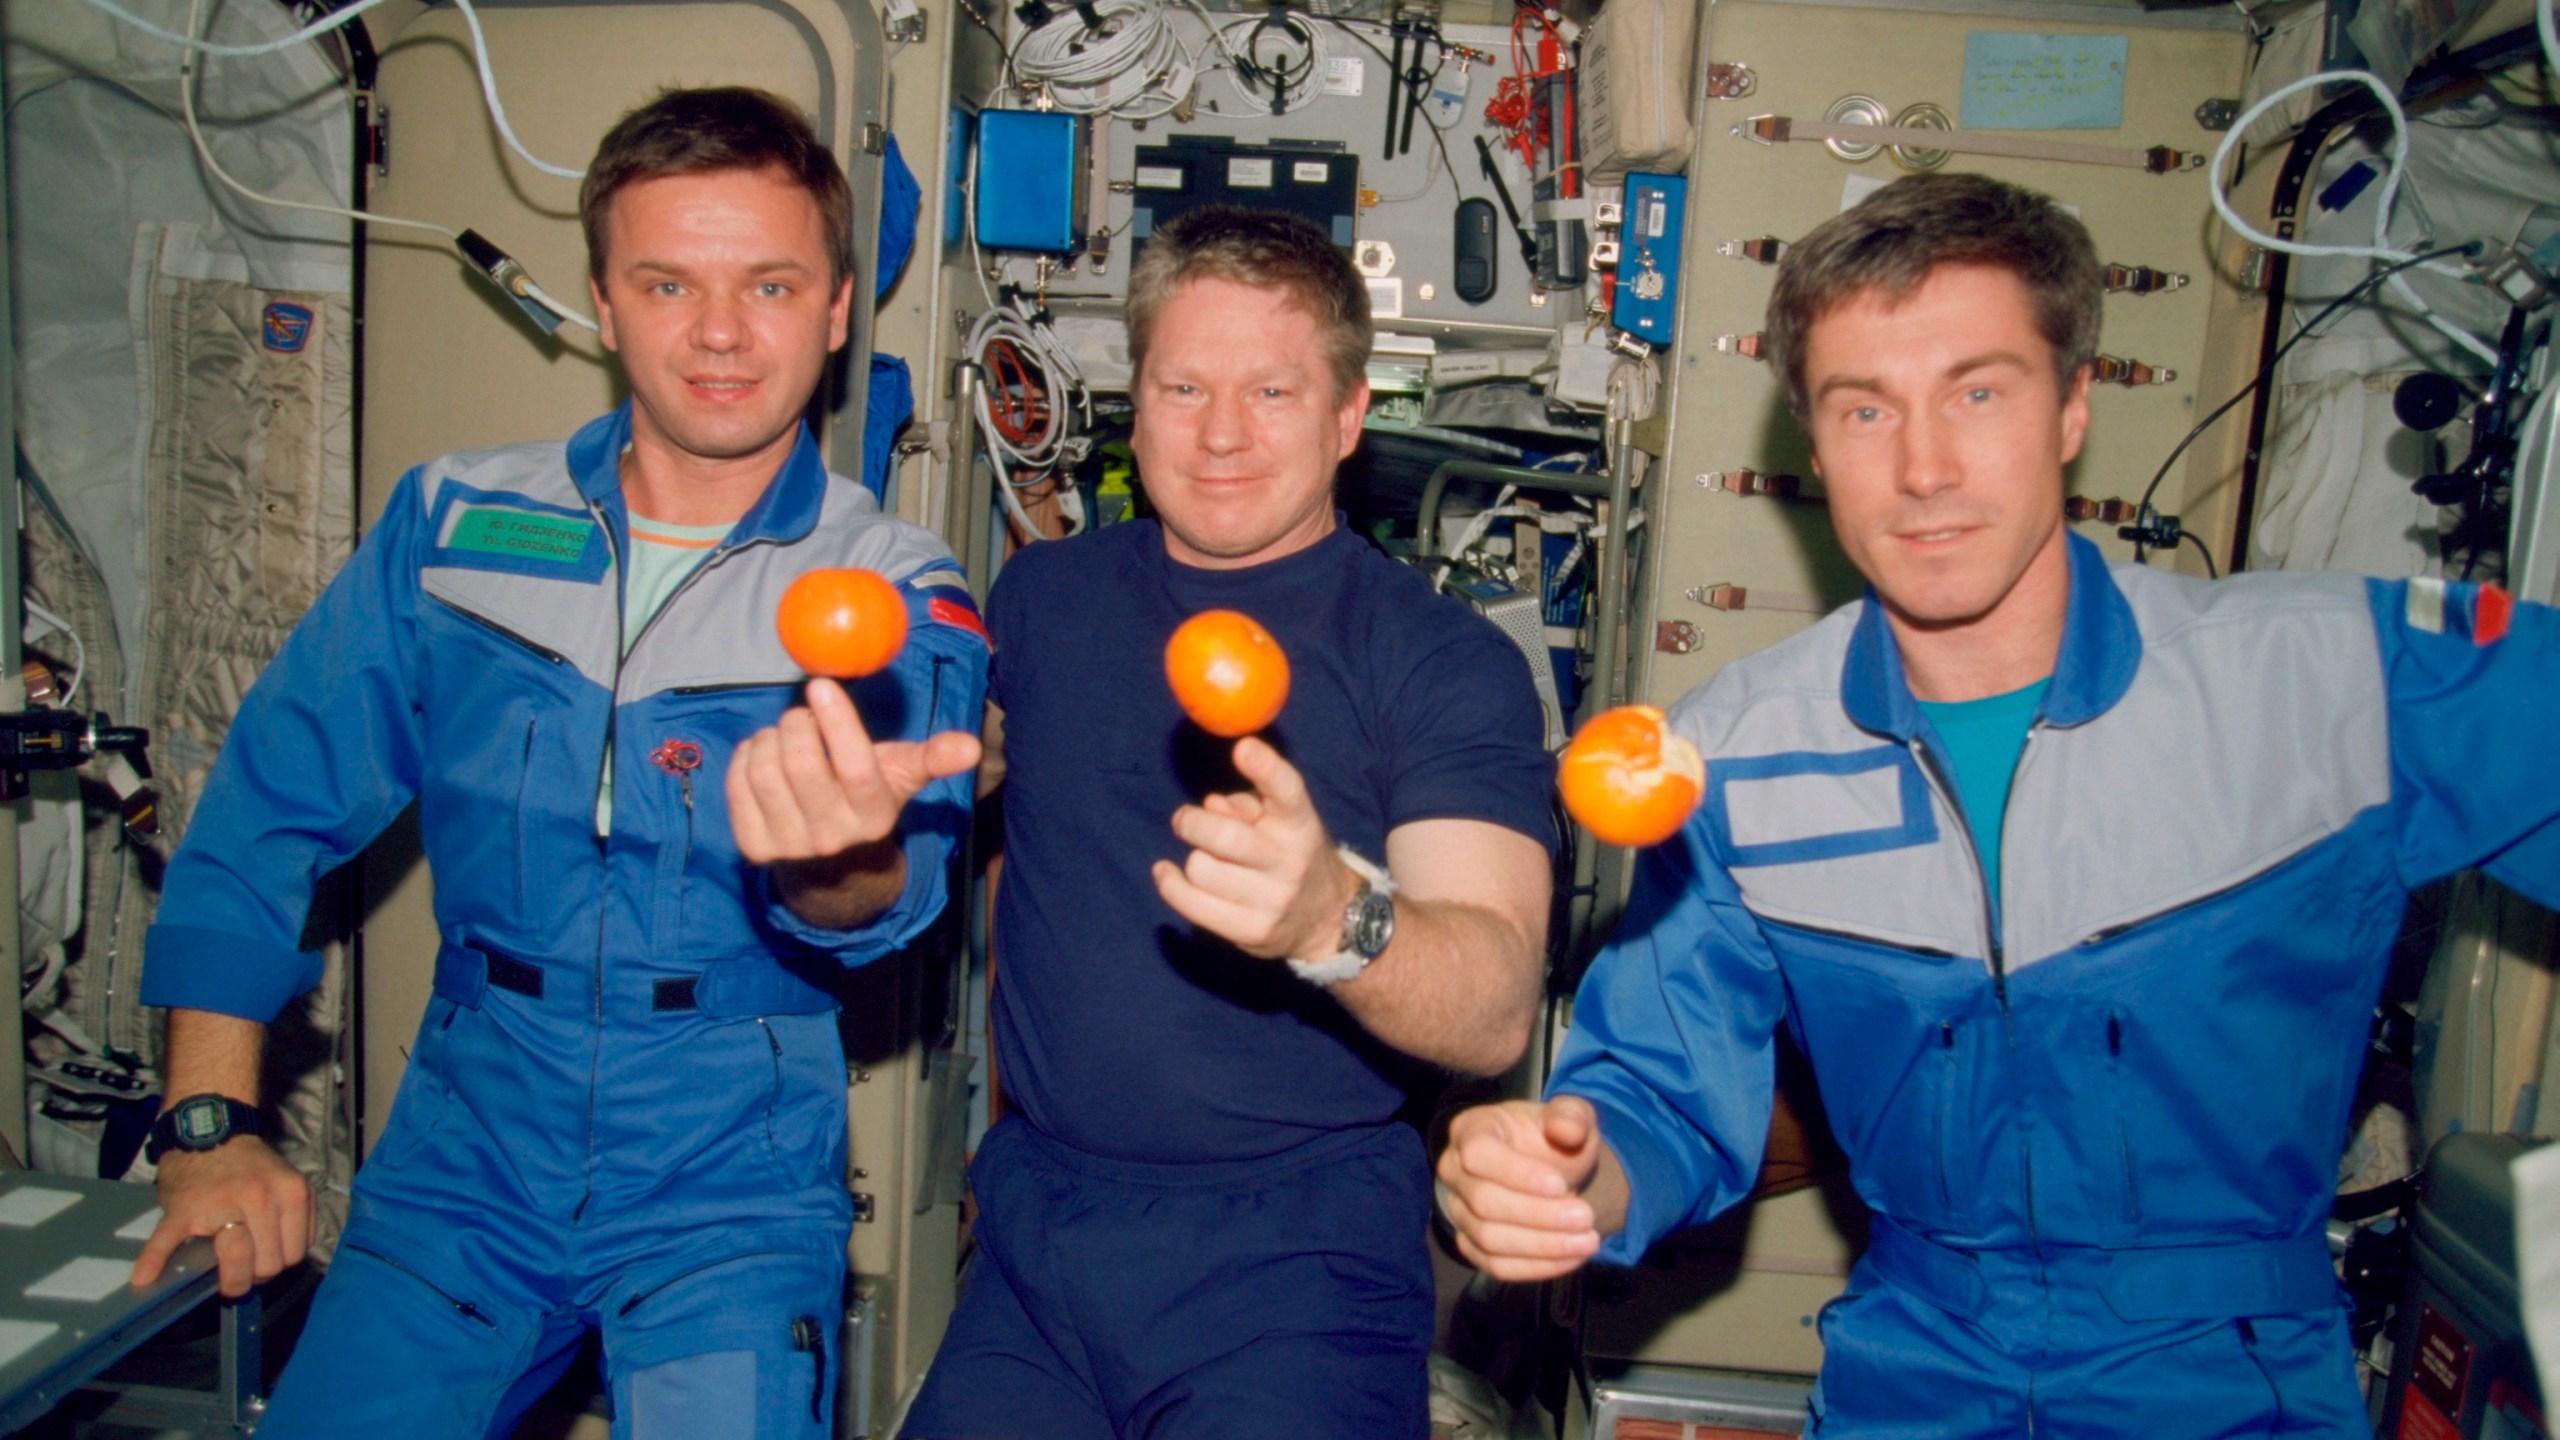 Yuri P. Gidzenko, William M. Shepherd, Sergei K. Krikalev